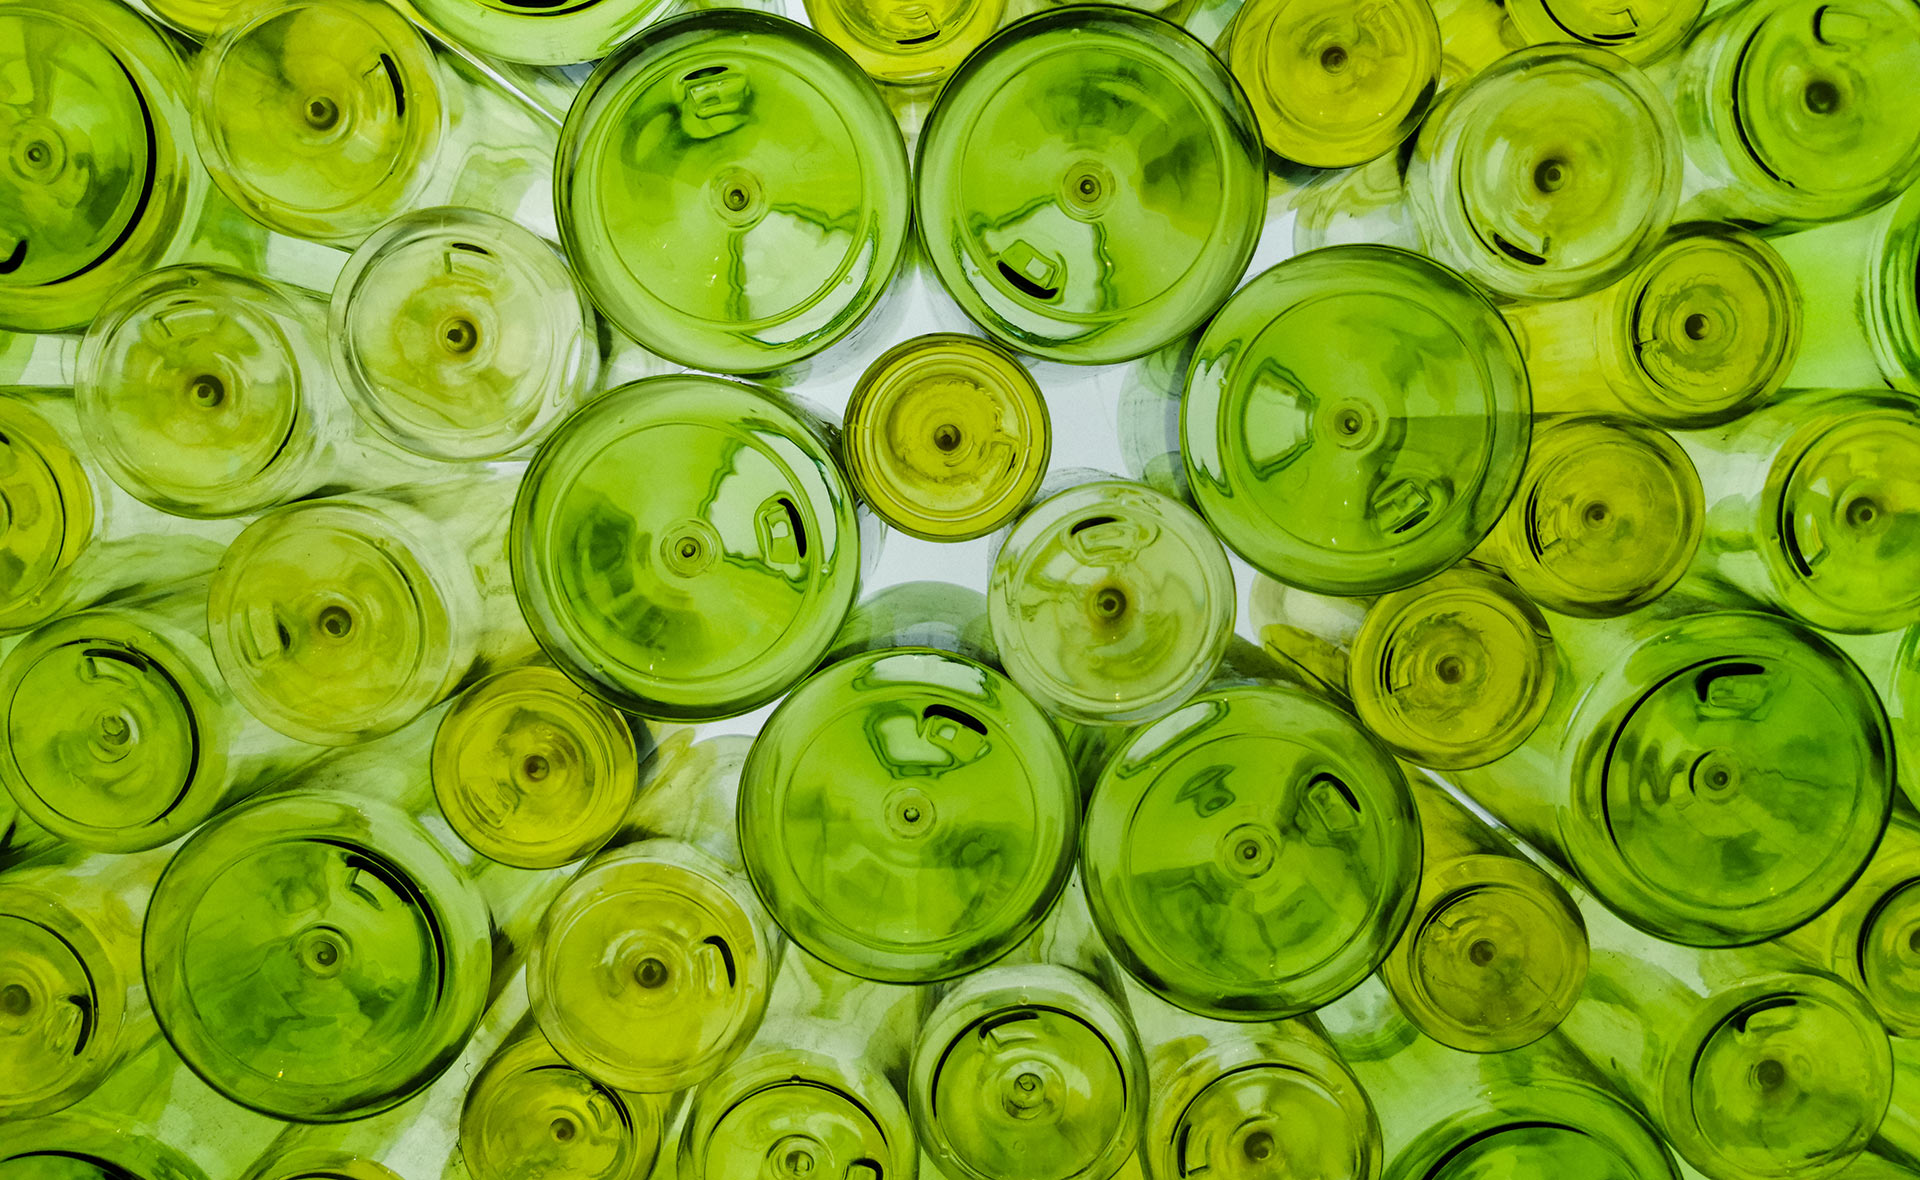 BBVA-reciclaje-vidrio-apertura-residuos-cristal-botellas-